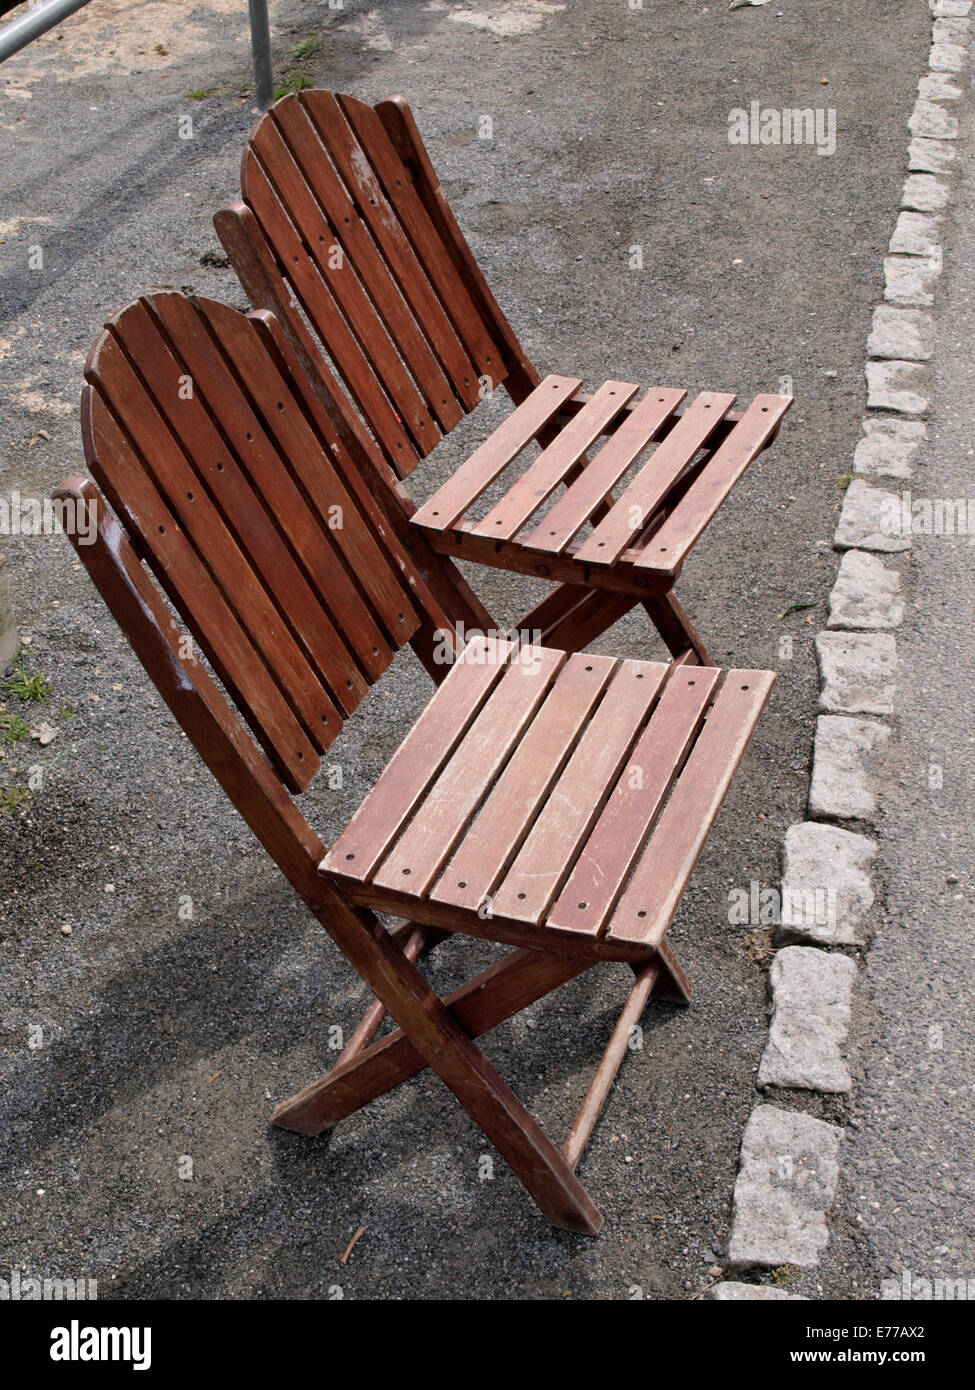 Fold Up Chair Stockfotos & Fold Up Chair Bilder - Alamy